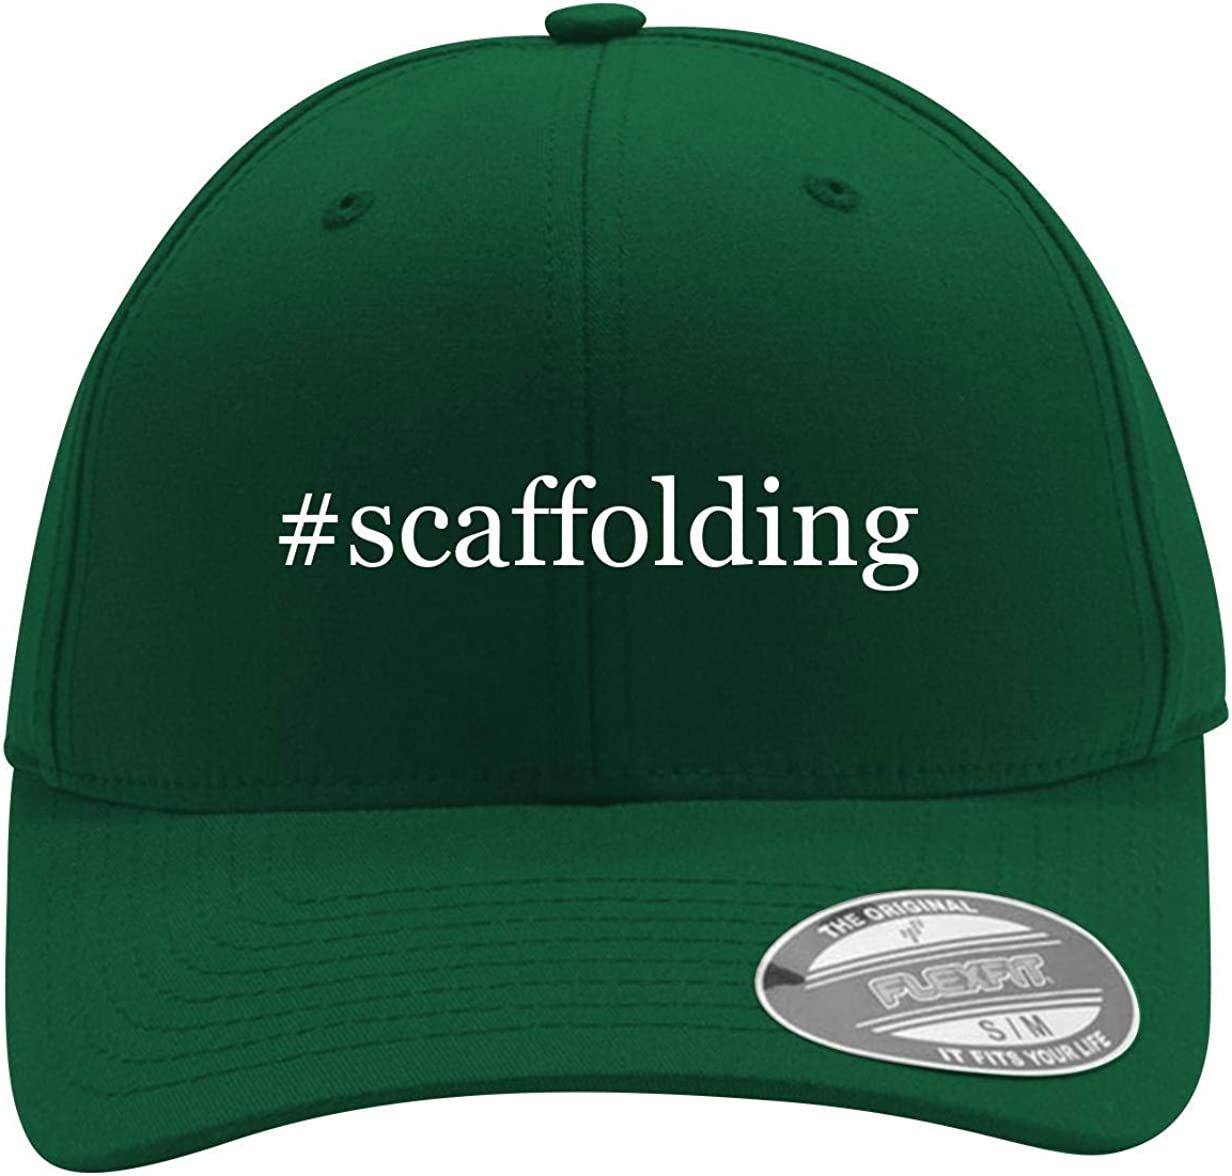 #Scaffolding - Men's Hashtag Flexfit Baseball Cap Hat